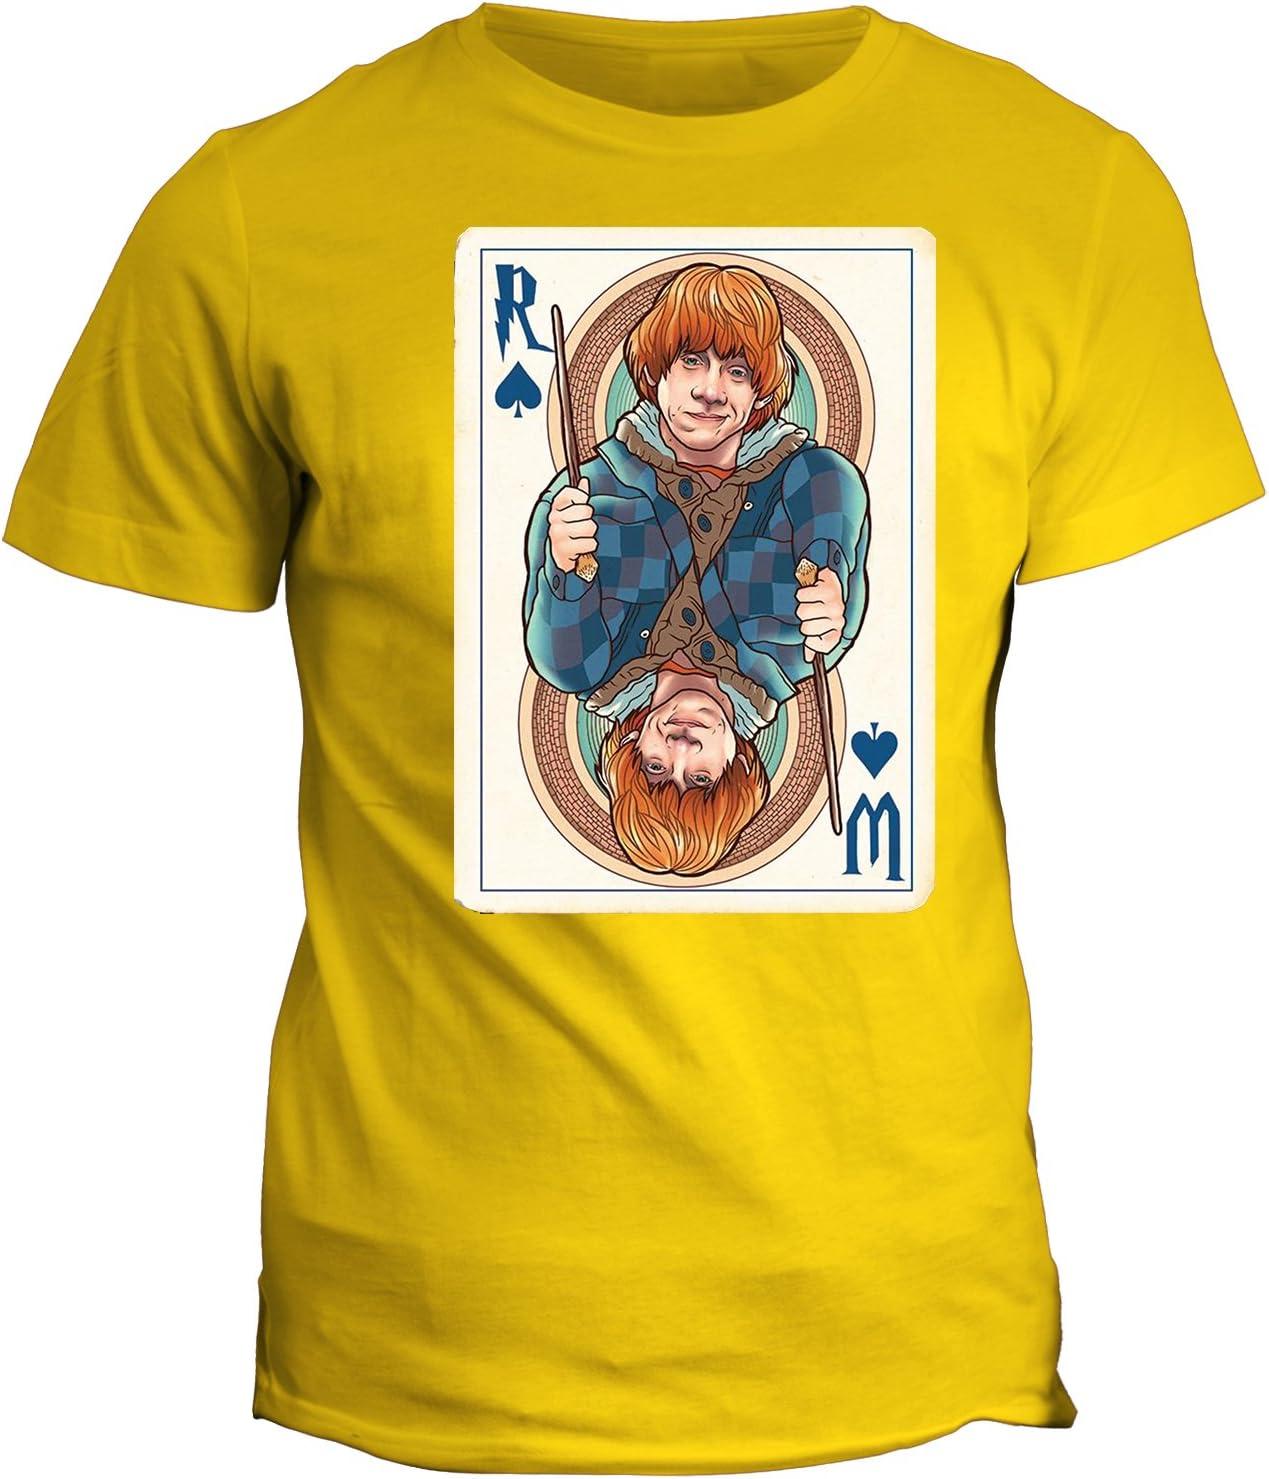 fashwork Tshirt Papel de Juegos Ron Ronald bilius Weasley ...